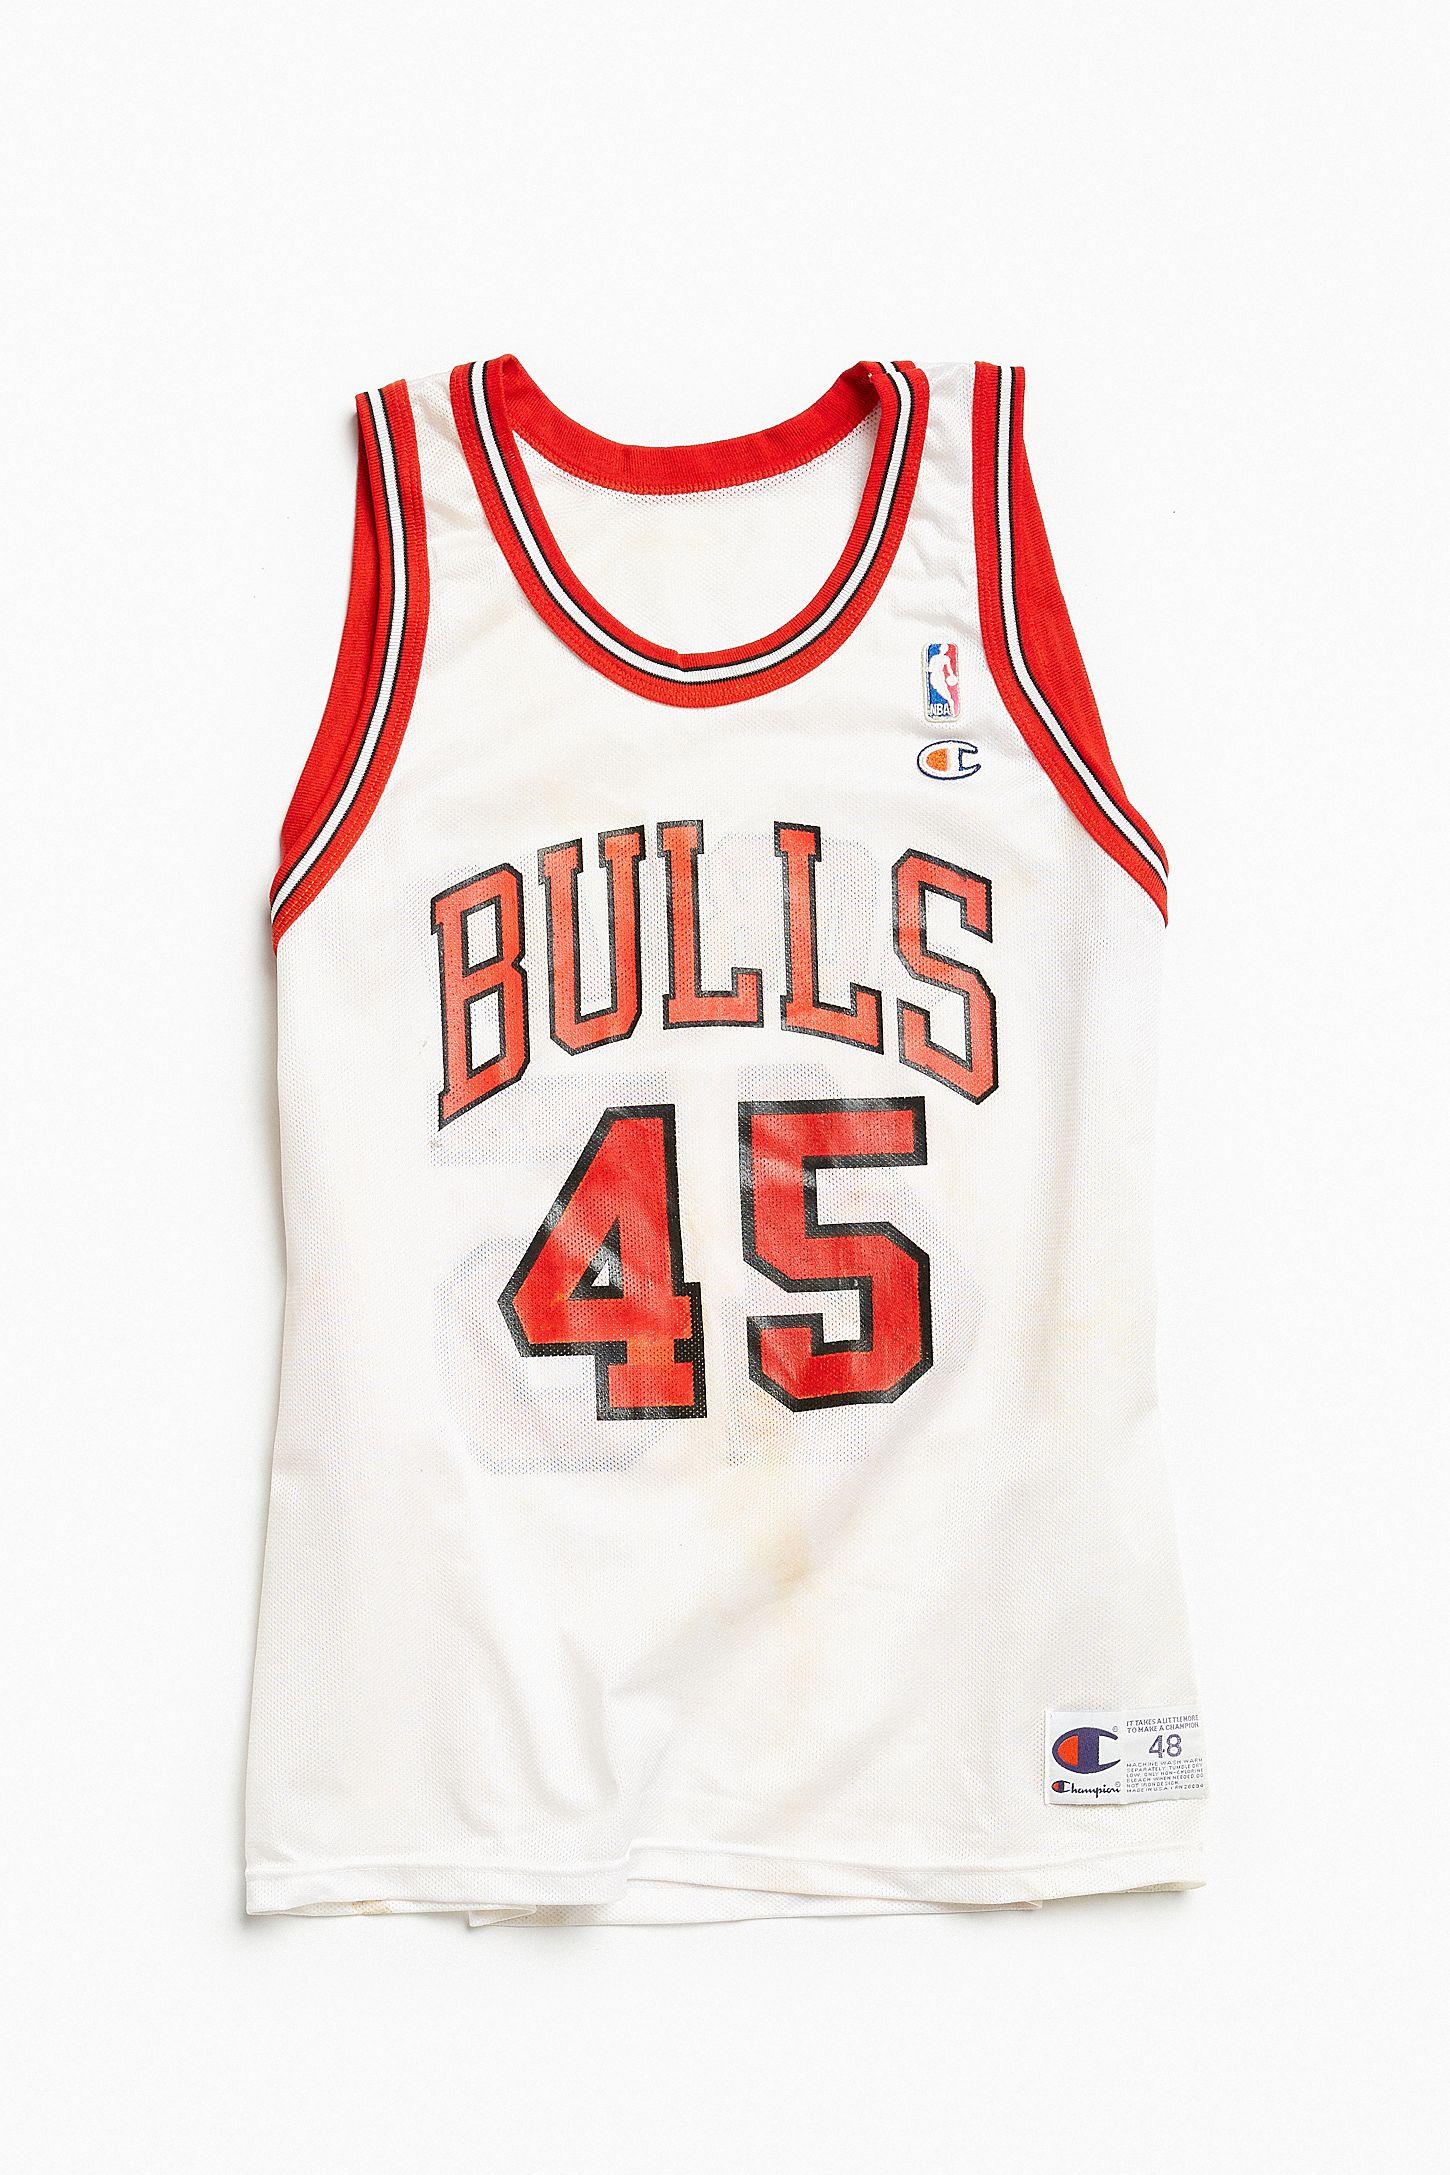 4d5cd04b7d3 Vintage Champion Michael Jordan Comeback Basketball Jersey | Urban ...